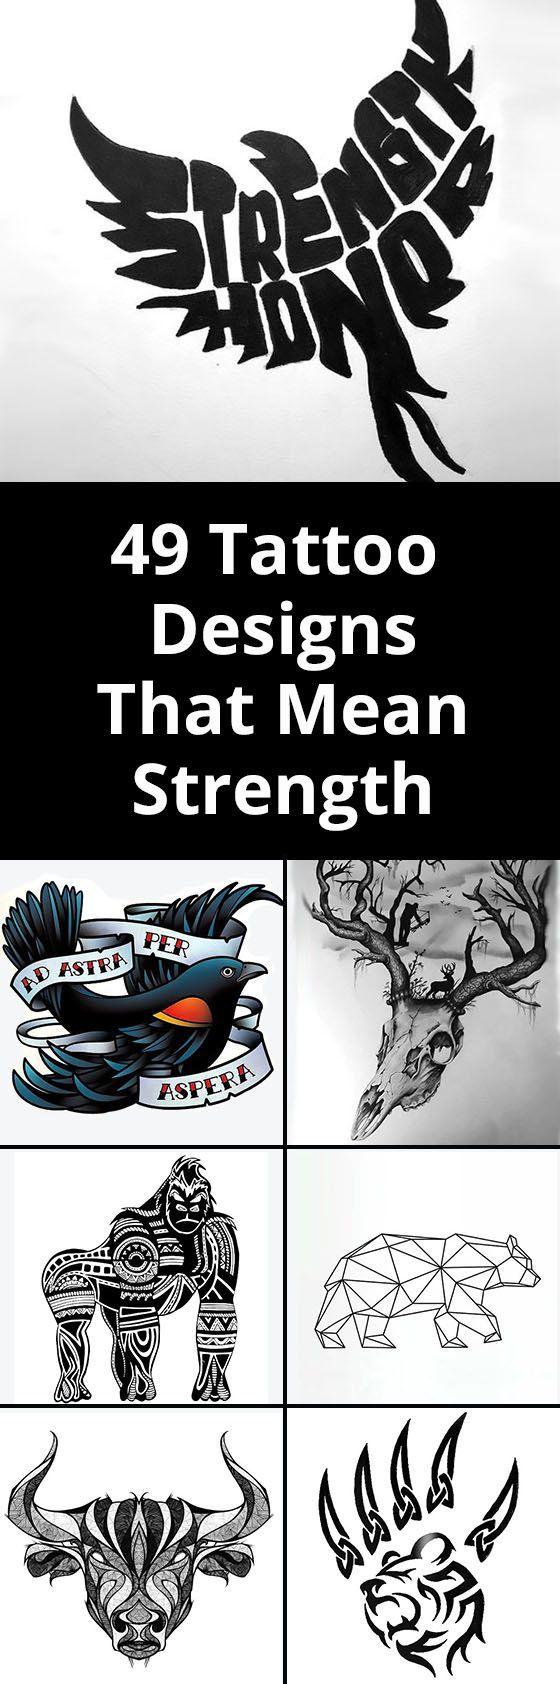 49 Tattoo Symbols That Represent Strength Strength Symbols And Tattoo